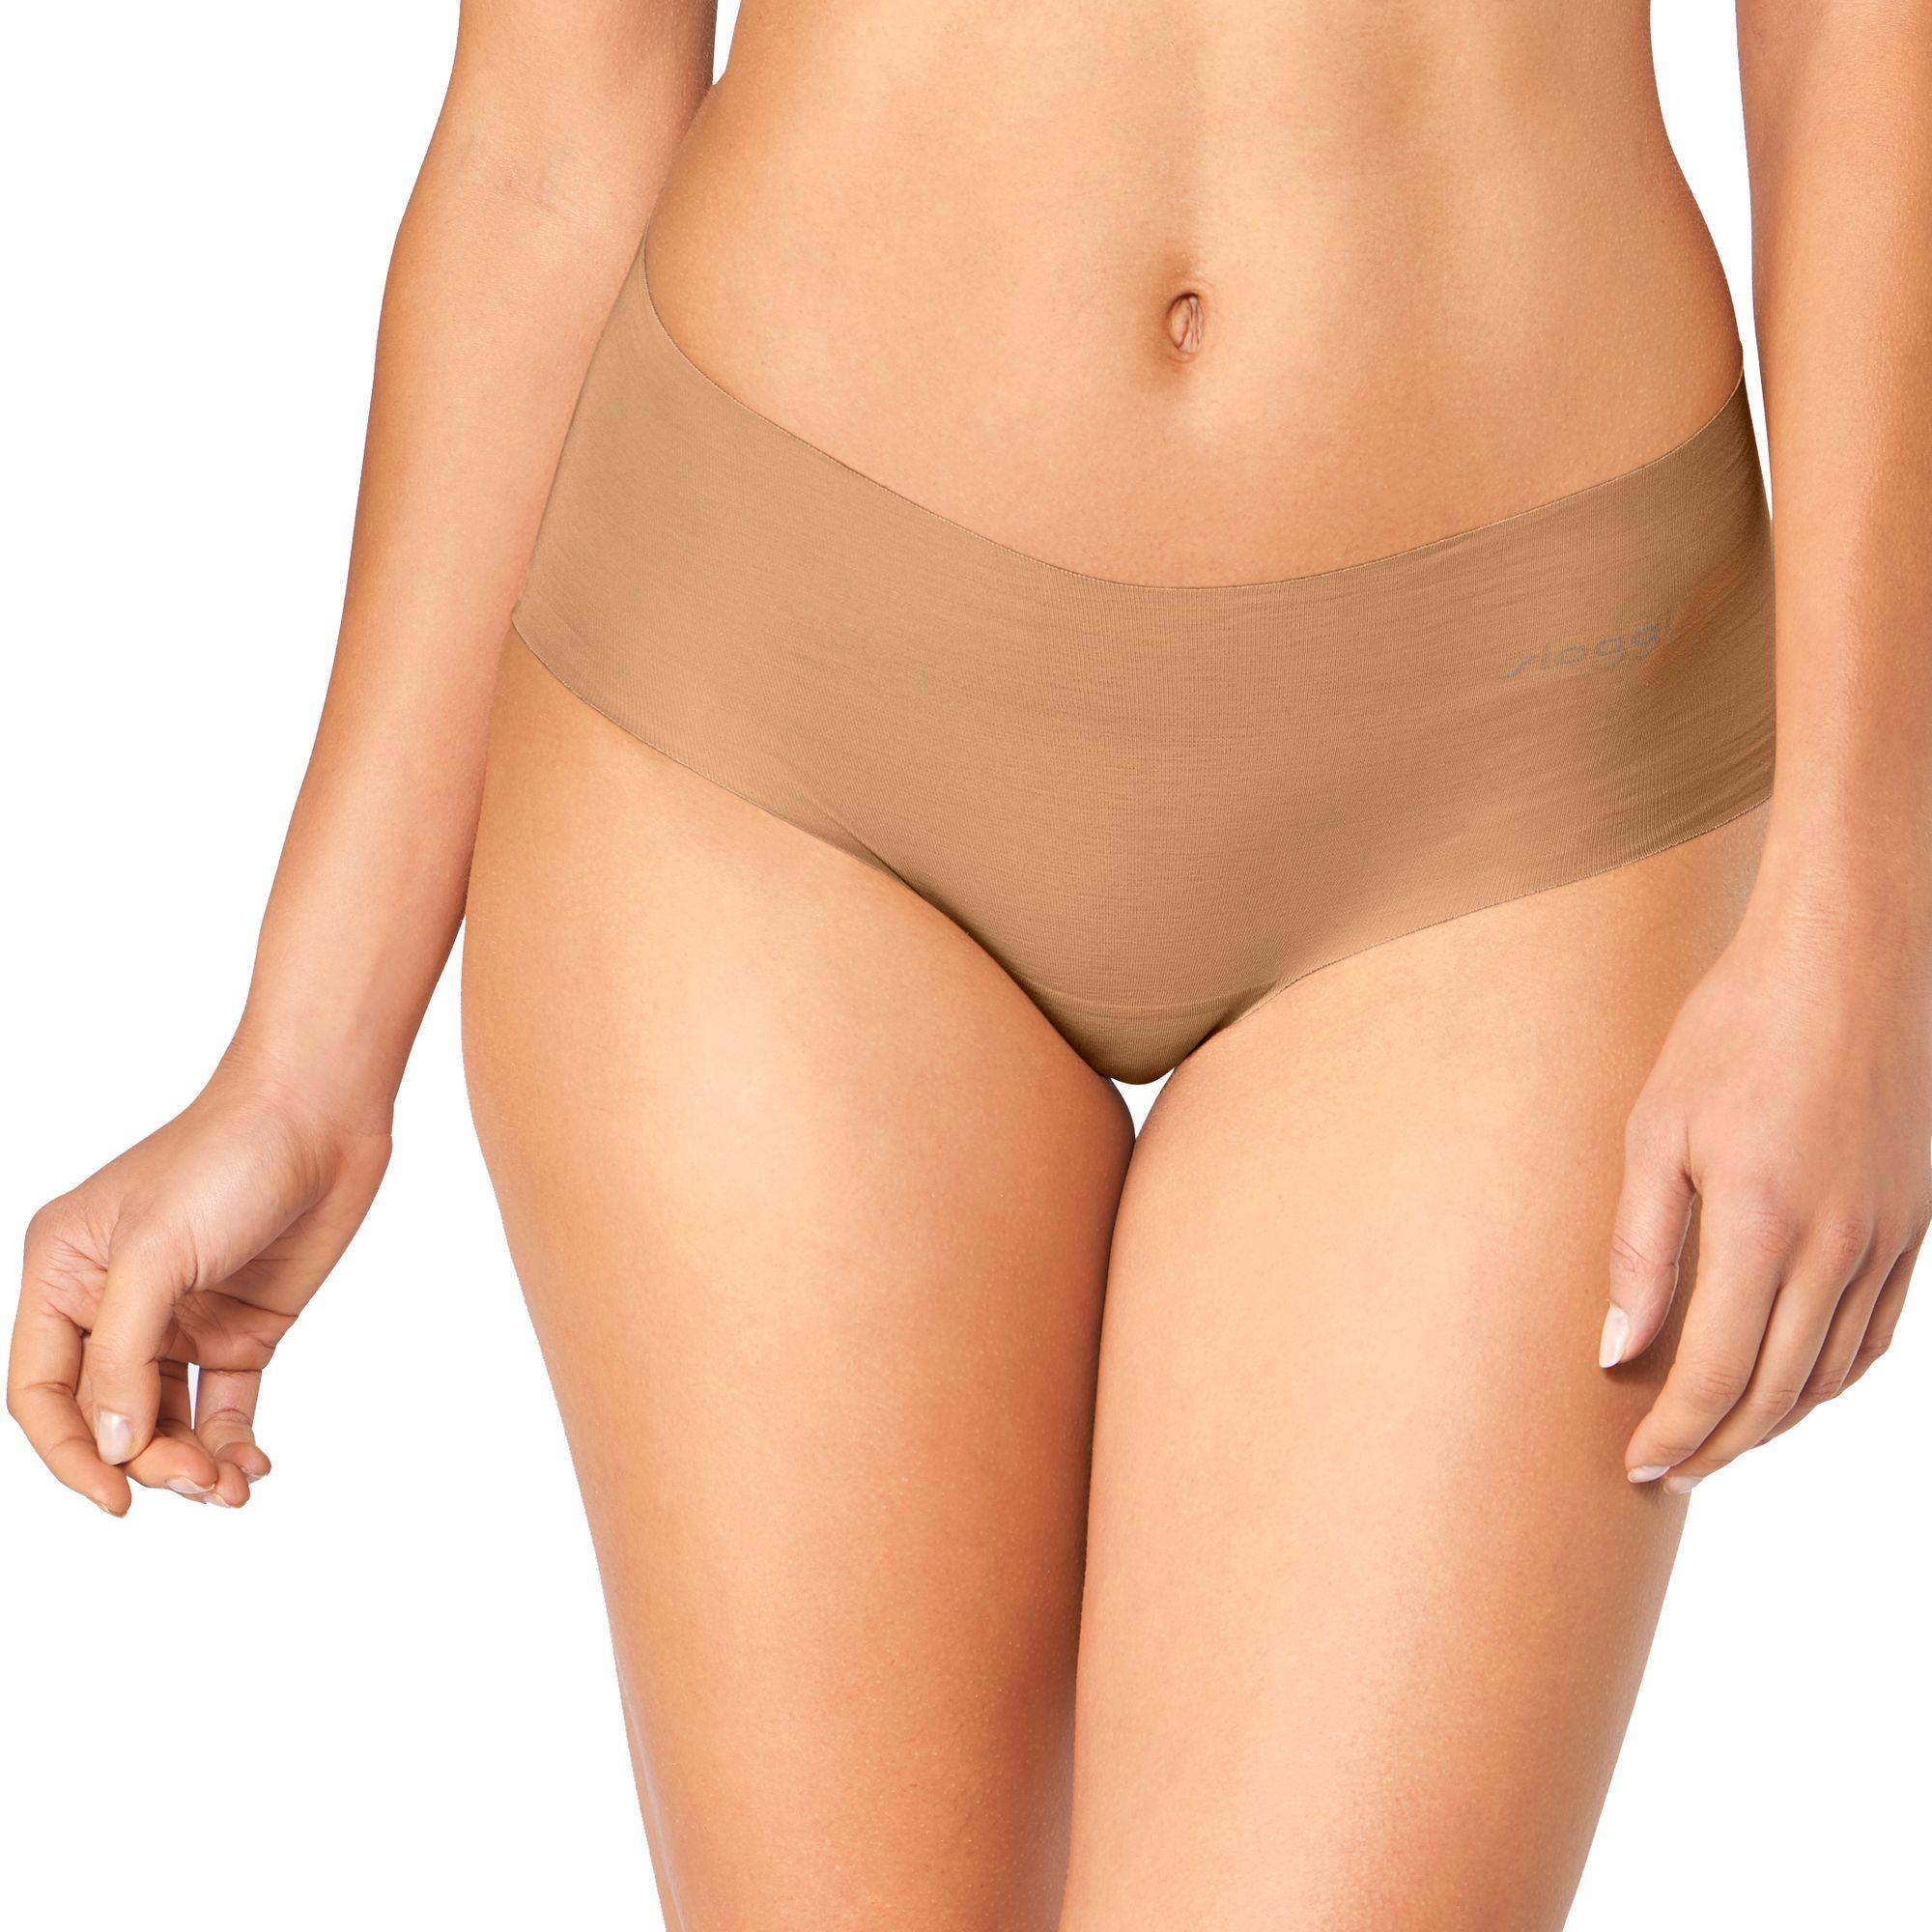 Sloggi Damen Shorts, Serie ZERO Cotton, 3 Stück  – Bild 8